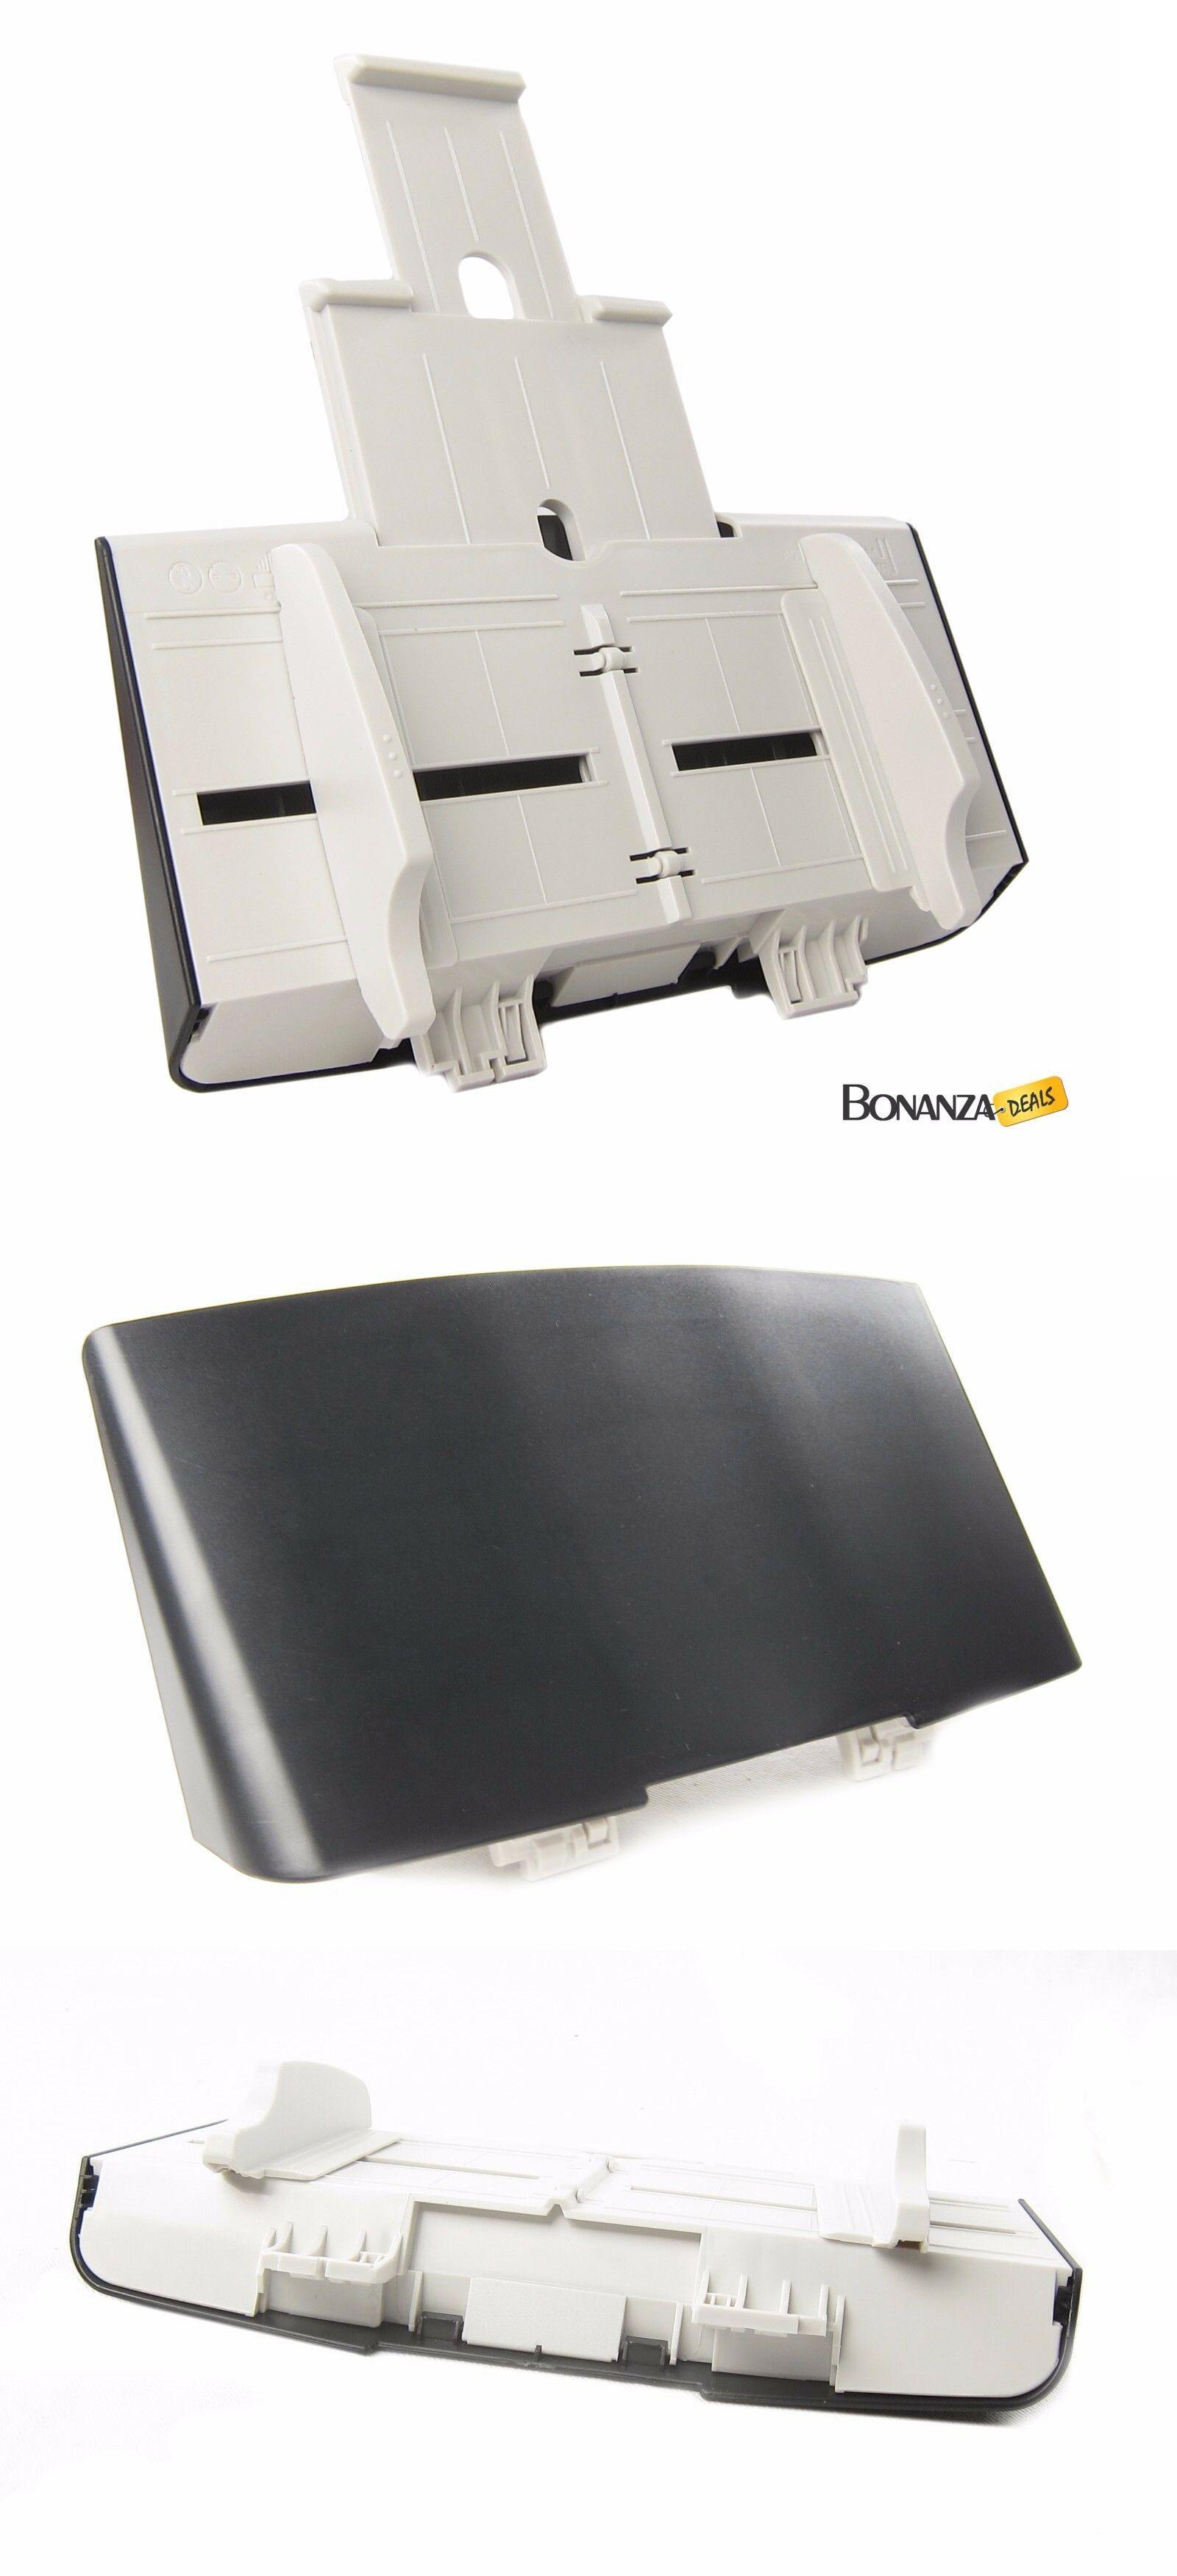 Chute Paper input tray For FUJITSU fi-7160 fi-7260 fi-7180 Scanner PA03670-E985